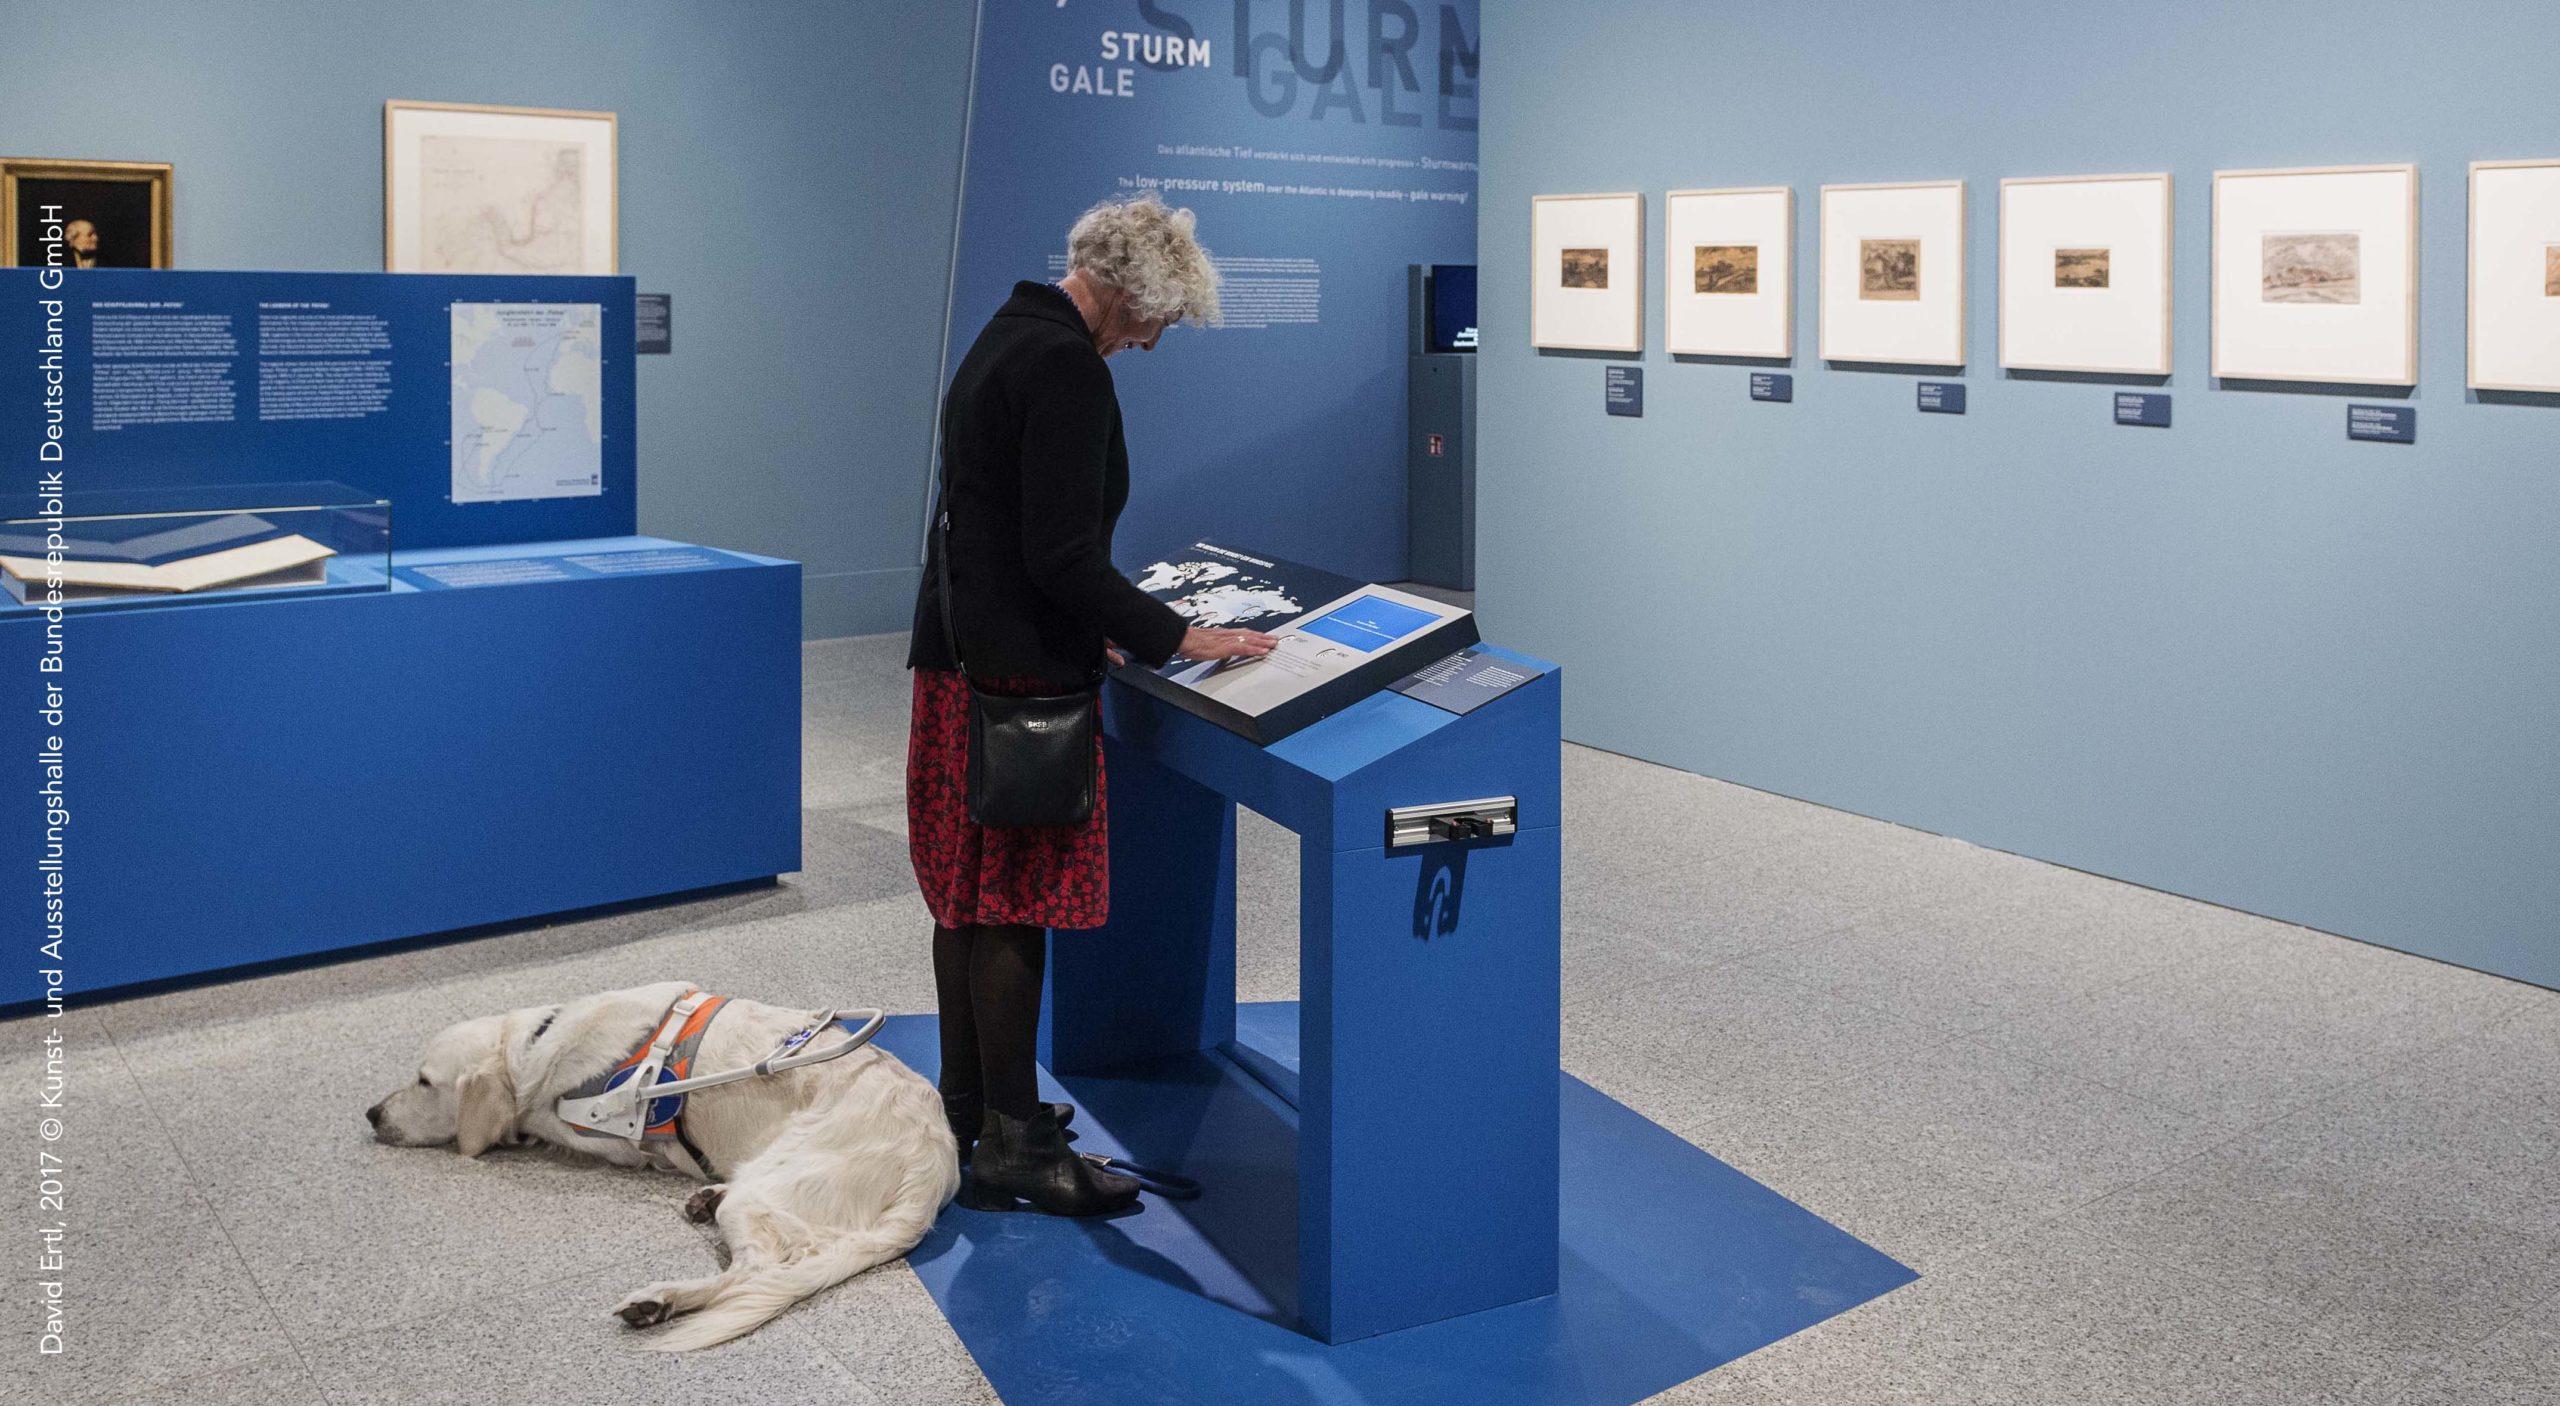 Visiteur malvoyant utilisant une station tactile, Bundeskunsthalle Bonn